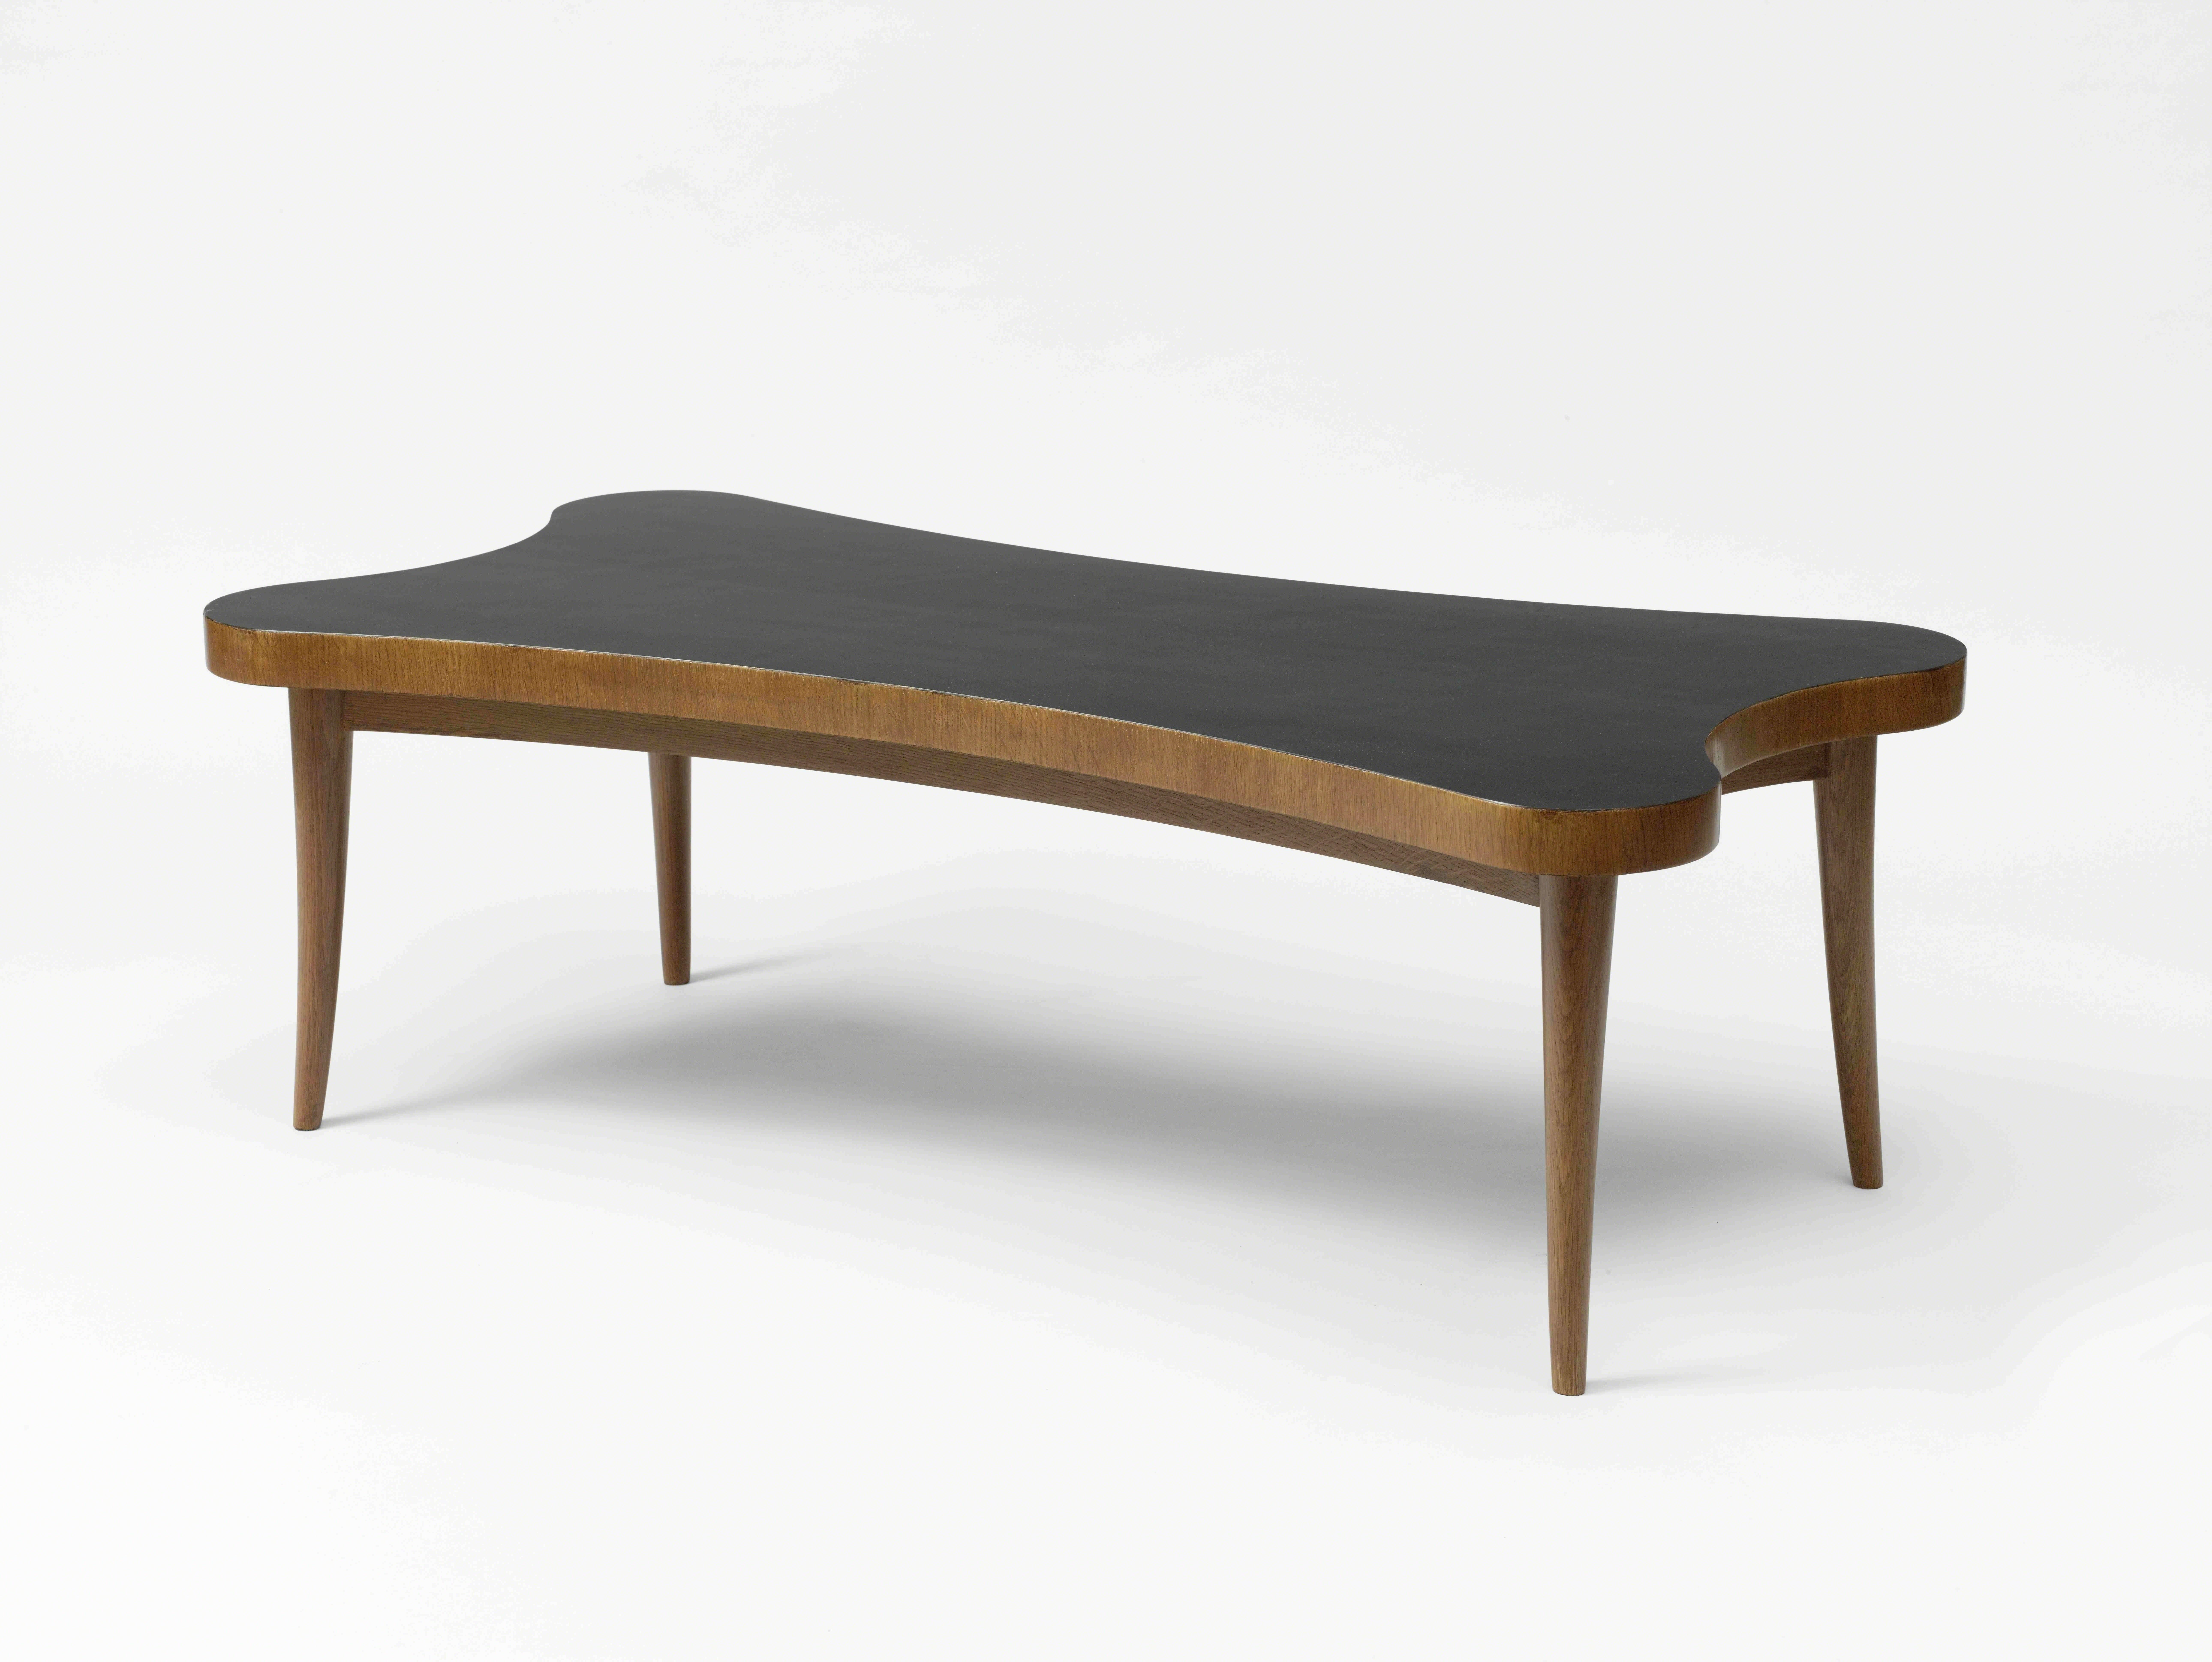 , 'Trèfle low table ,' ca. 1955, Galerie Patrick Seguin